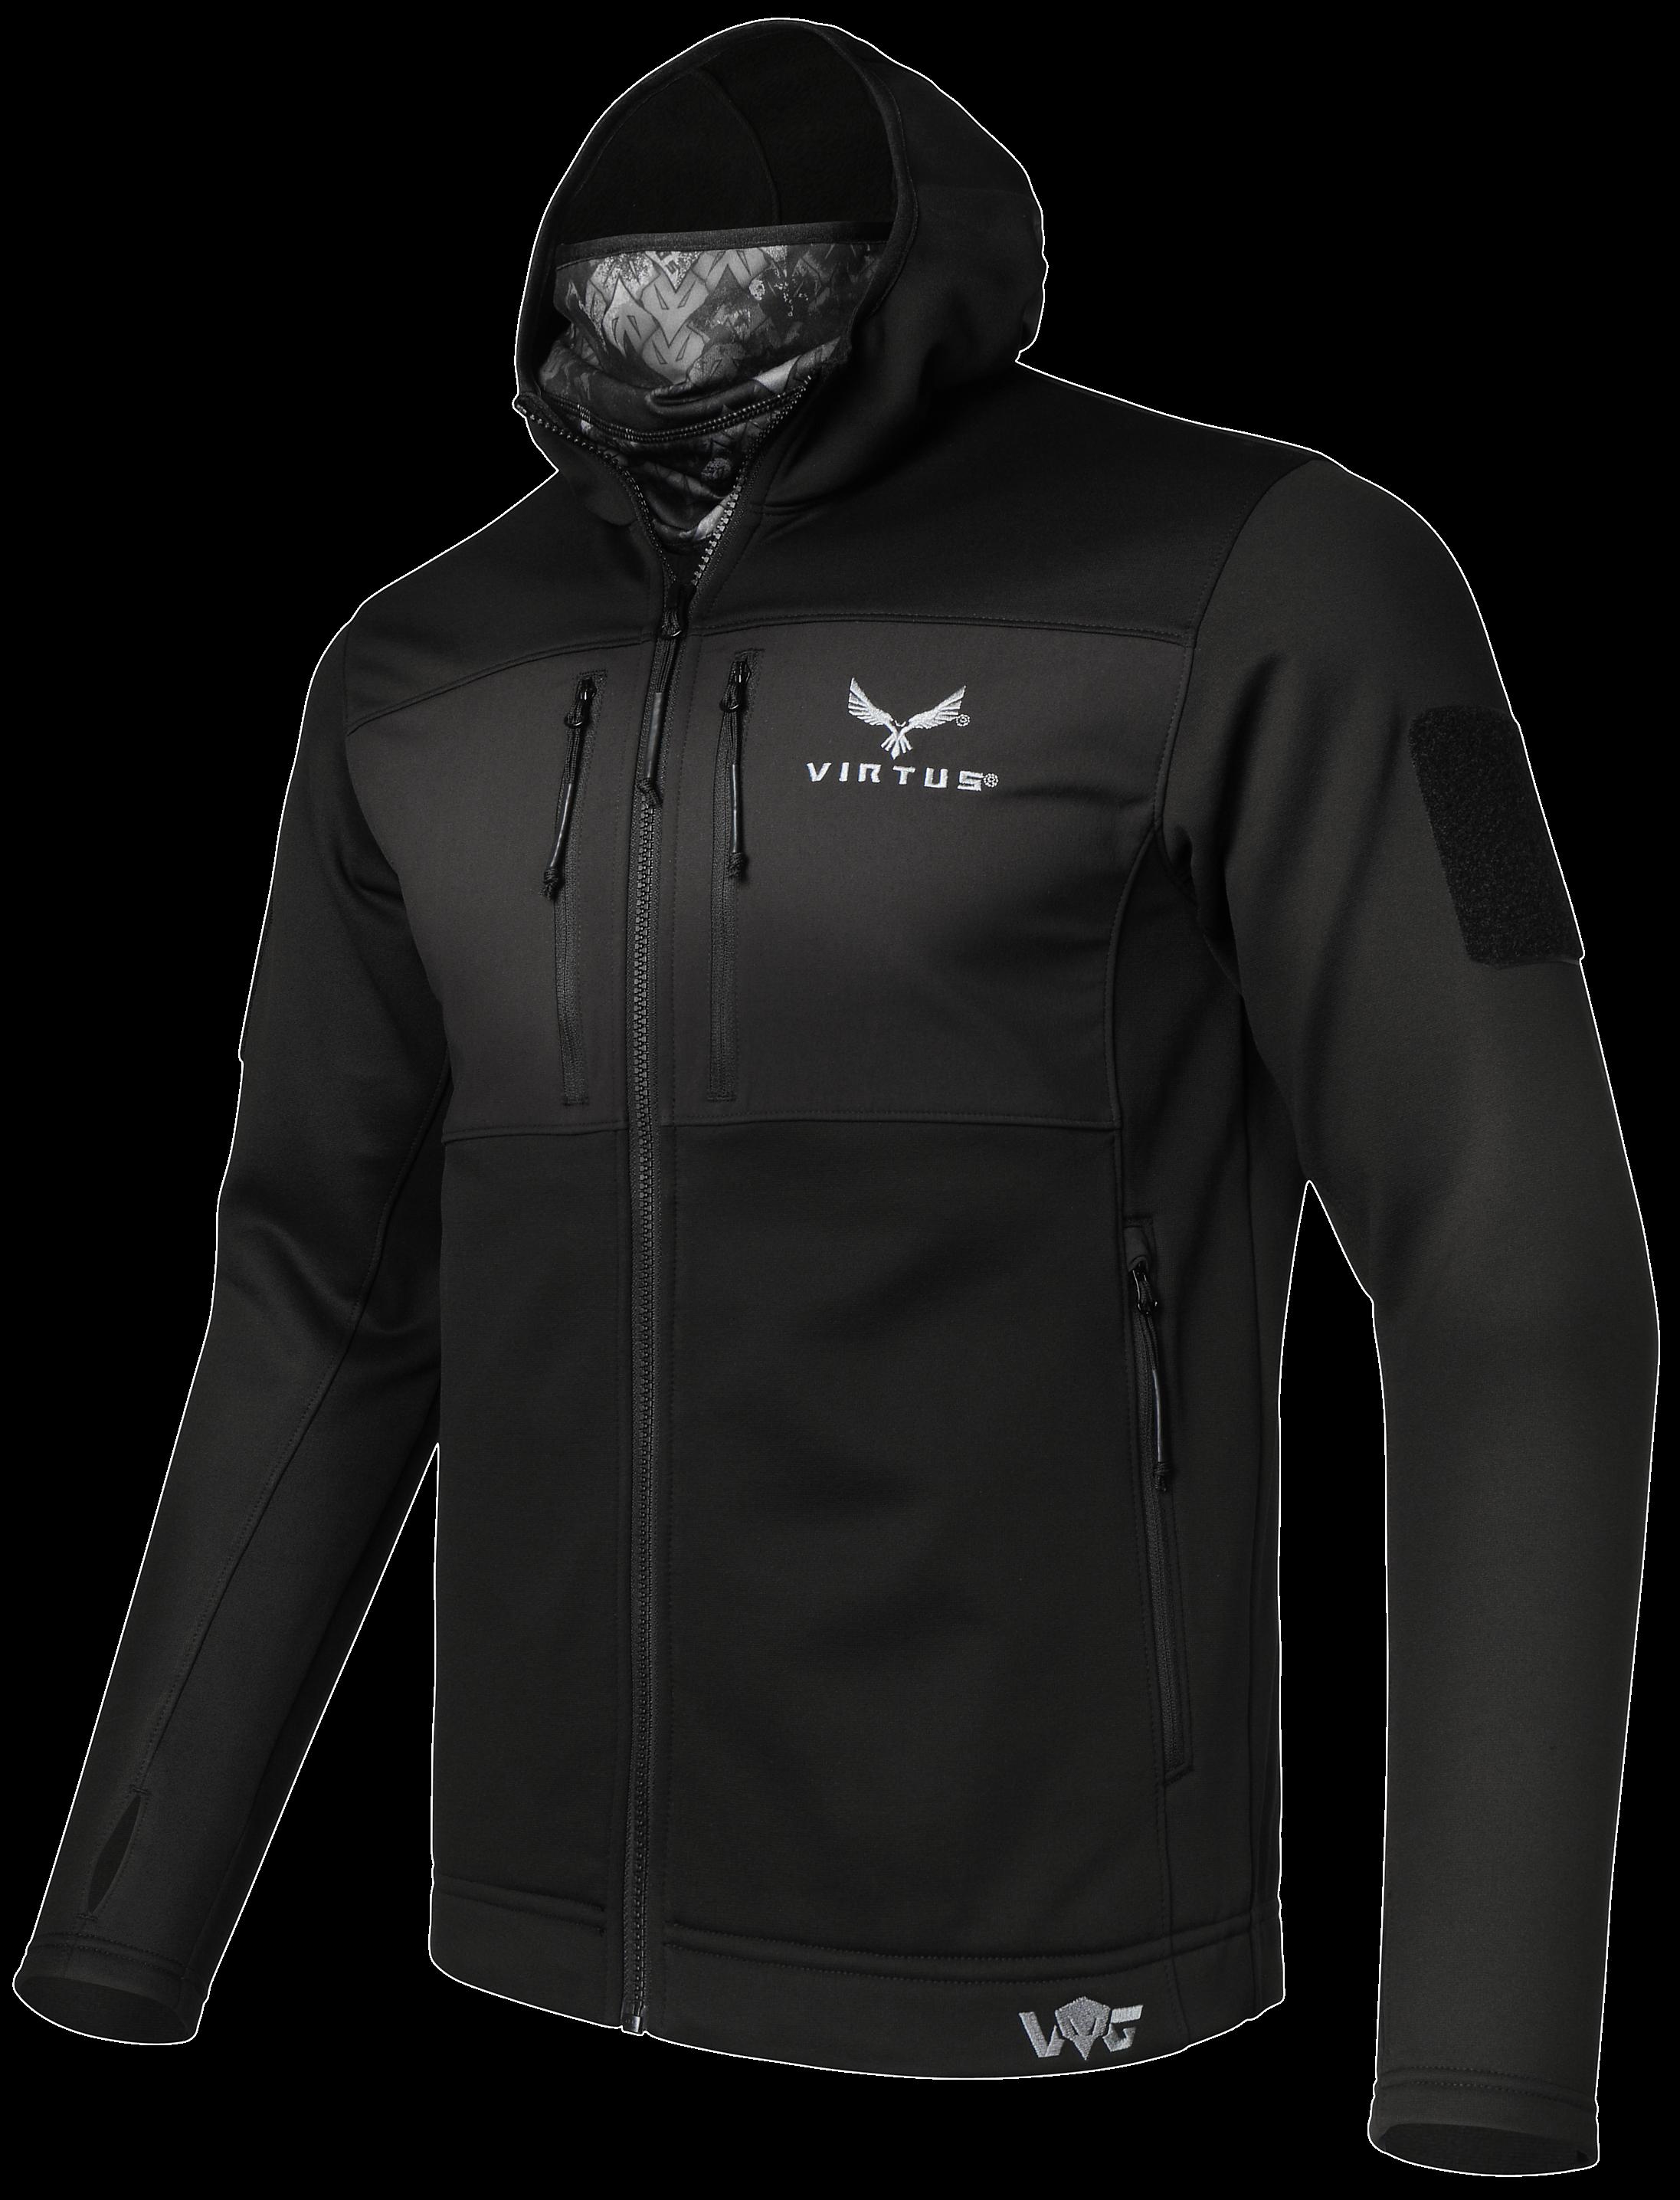 Jacket clipart waterproof jacket. Virtus system named after